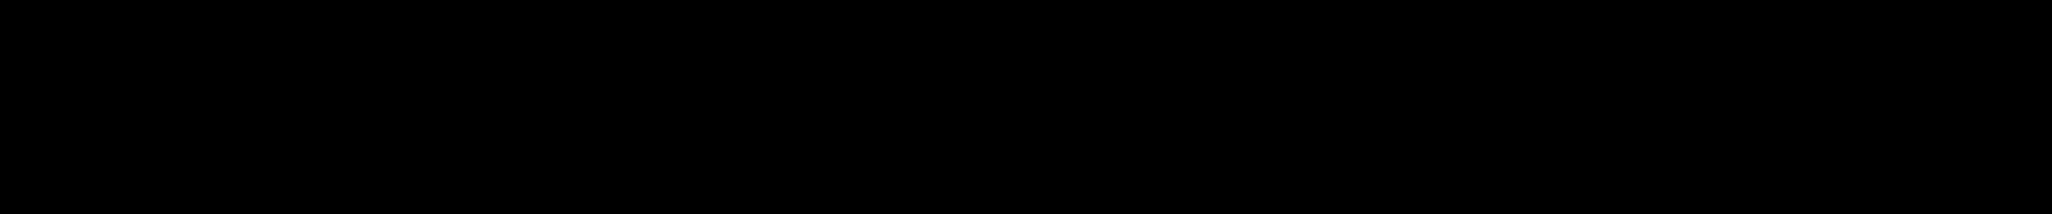 Mustang Font by Robert Arnow : Font Bros